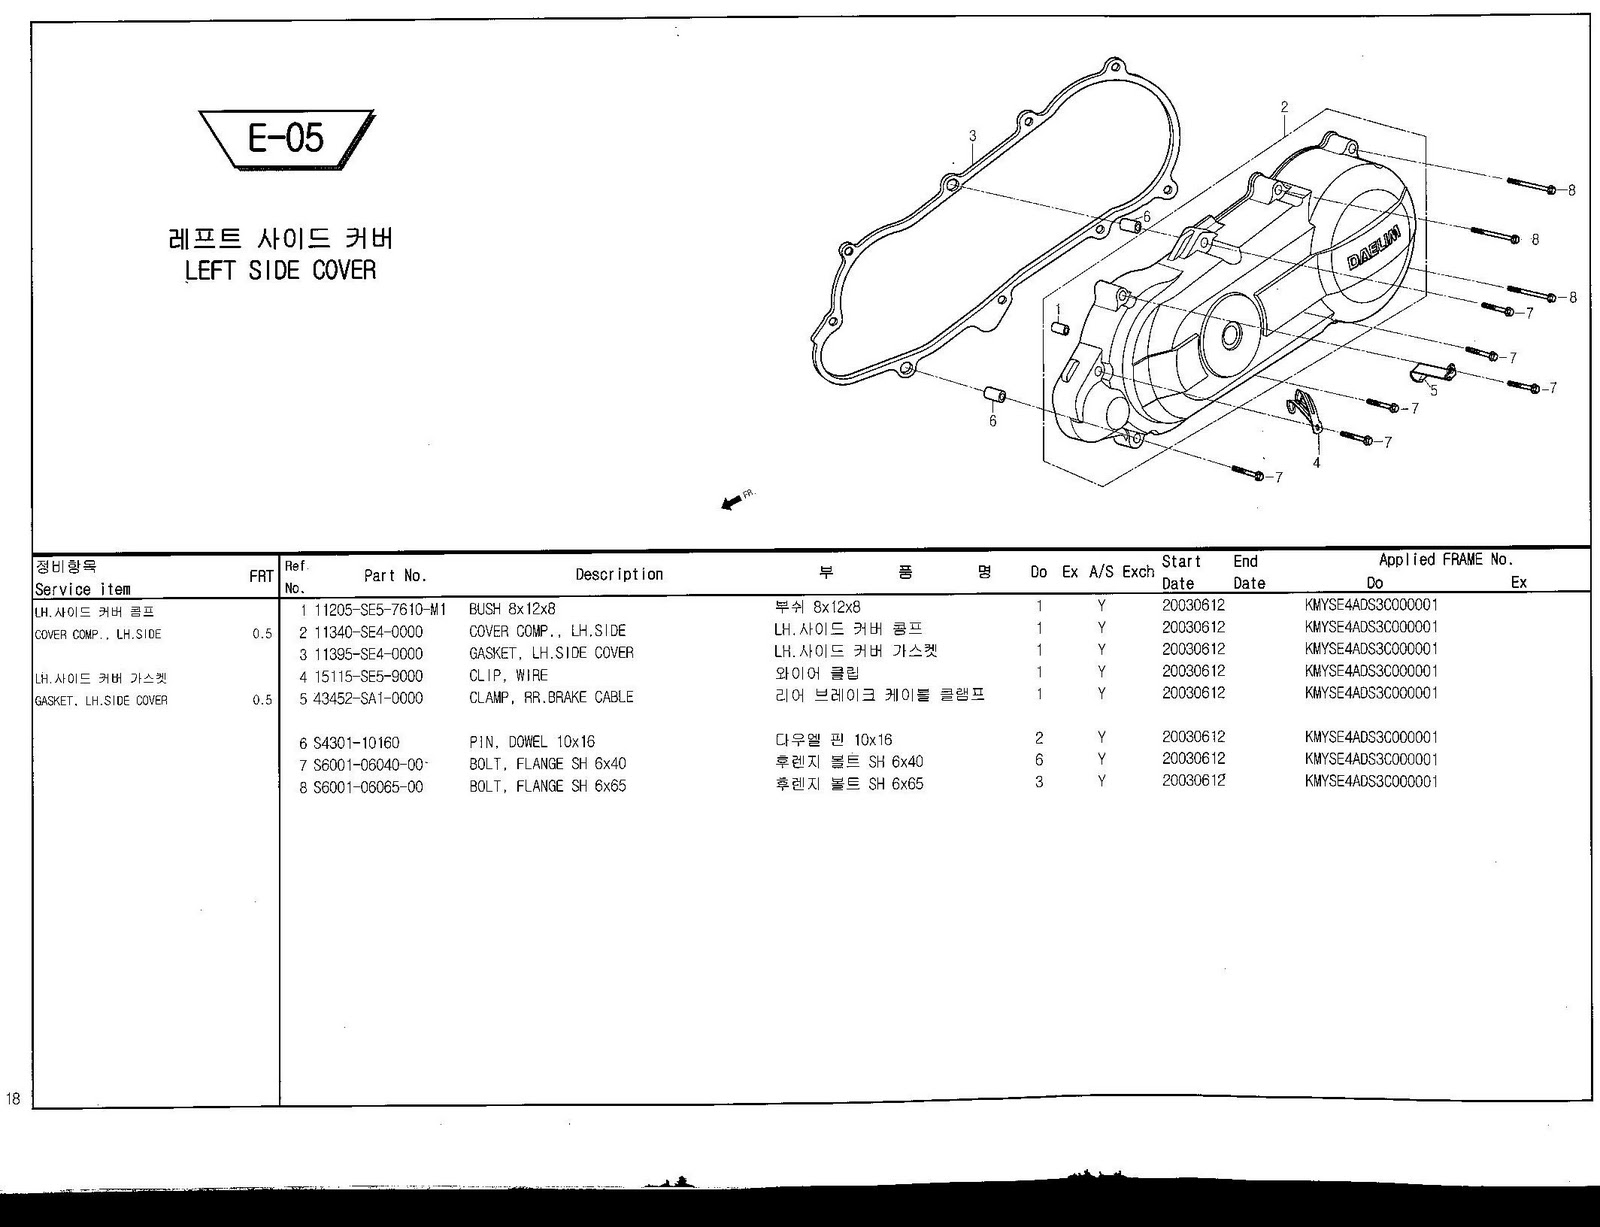 velux wiring diagram auto electrical wiring diagram simple alternator diagram 12v wiring x3cbx3ediagramx3c bx3e the [ 1600 x 1227 Pixel ]